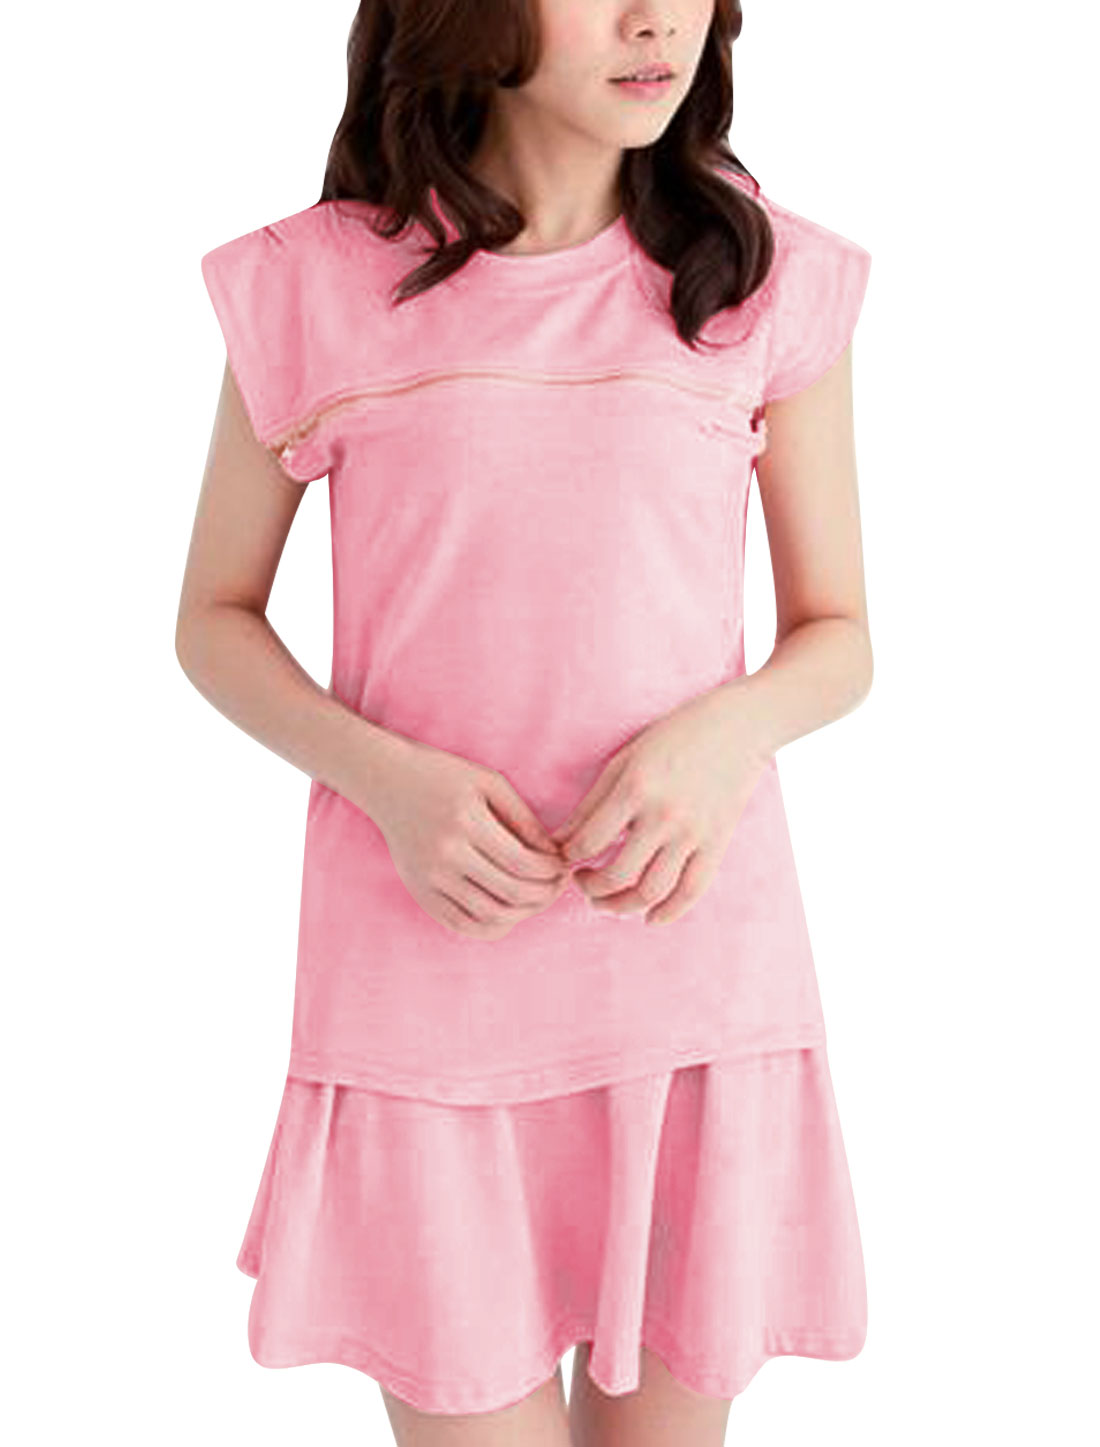 Lady Batwing Sleeve Zipper Decor Top w Stretchy Waist Skirt Light Pink XS